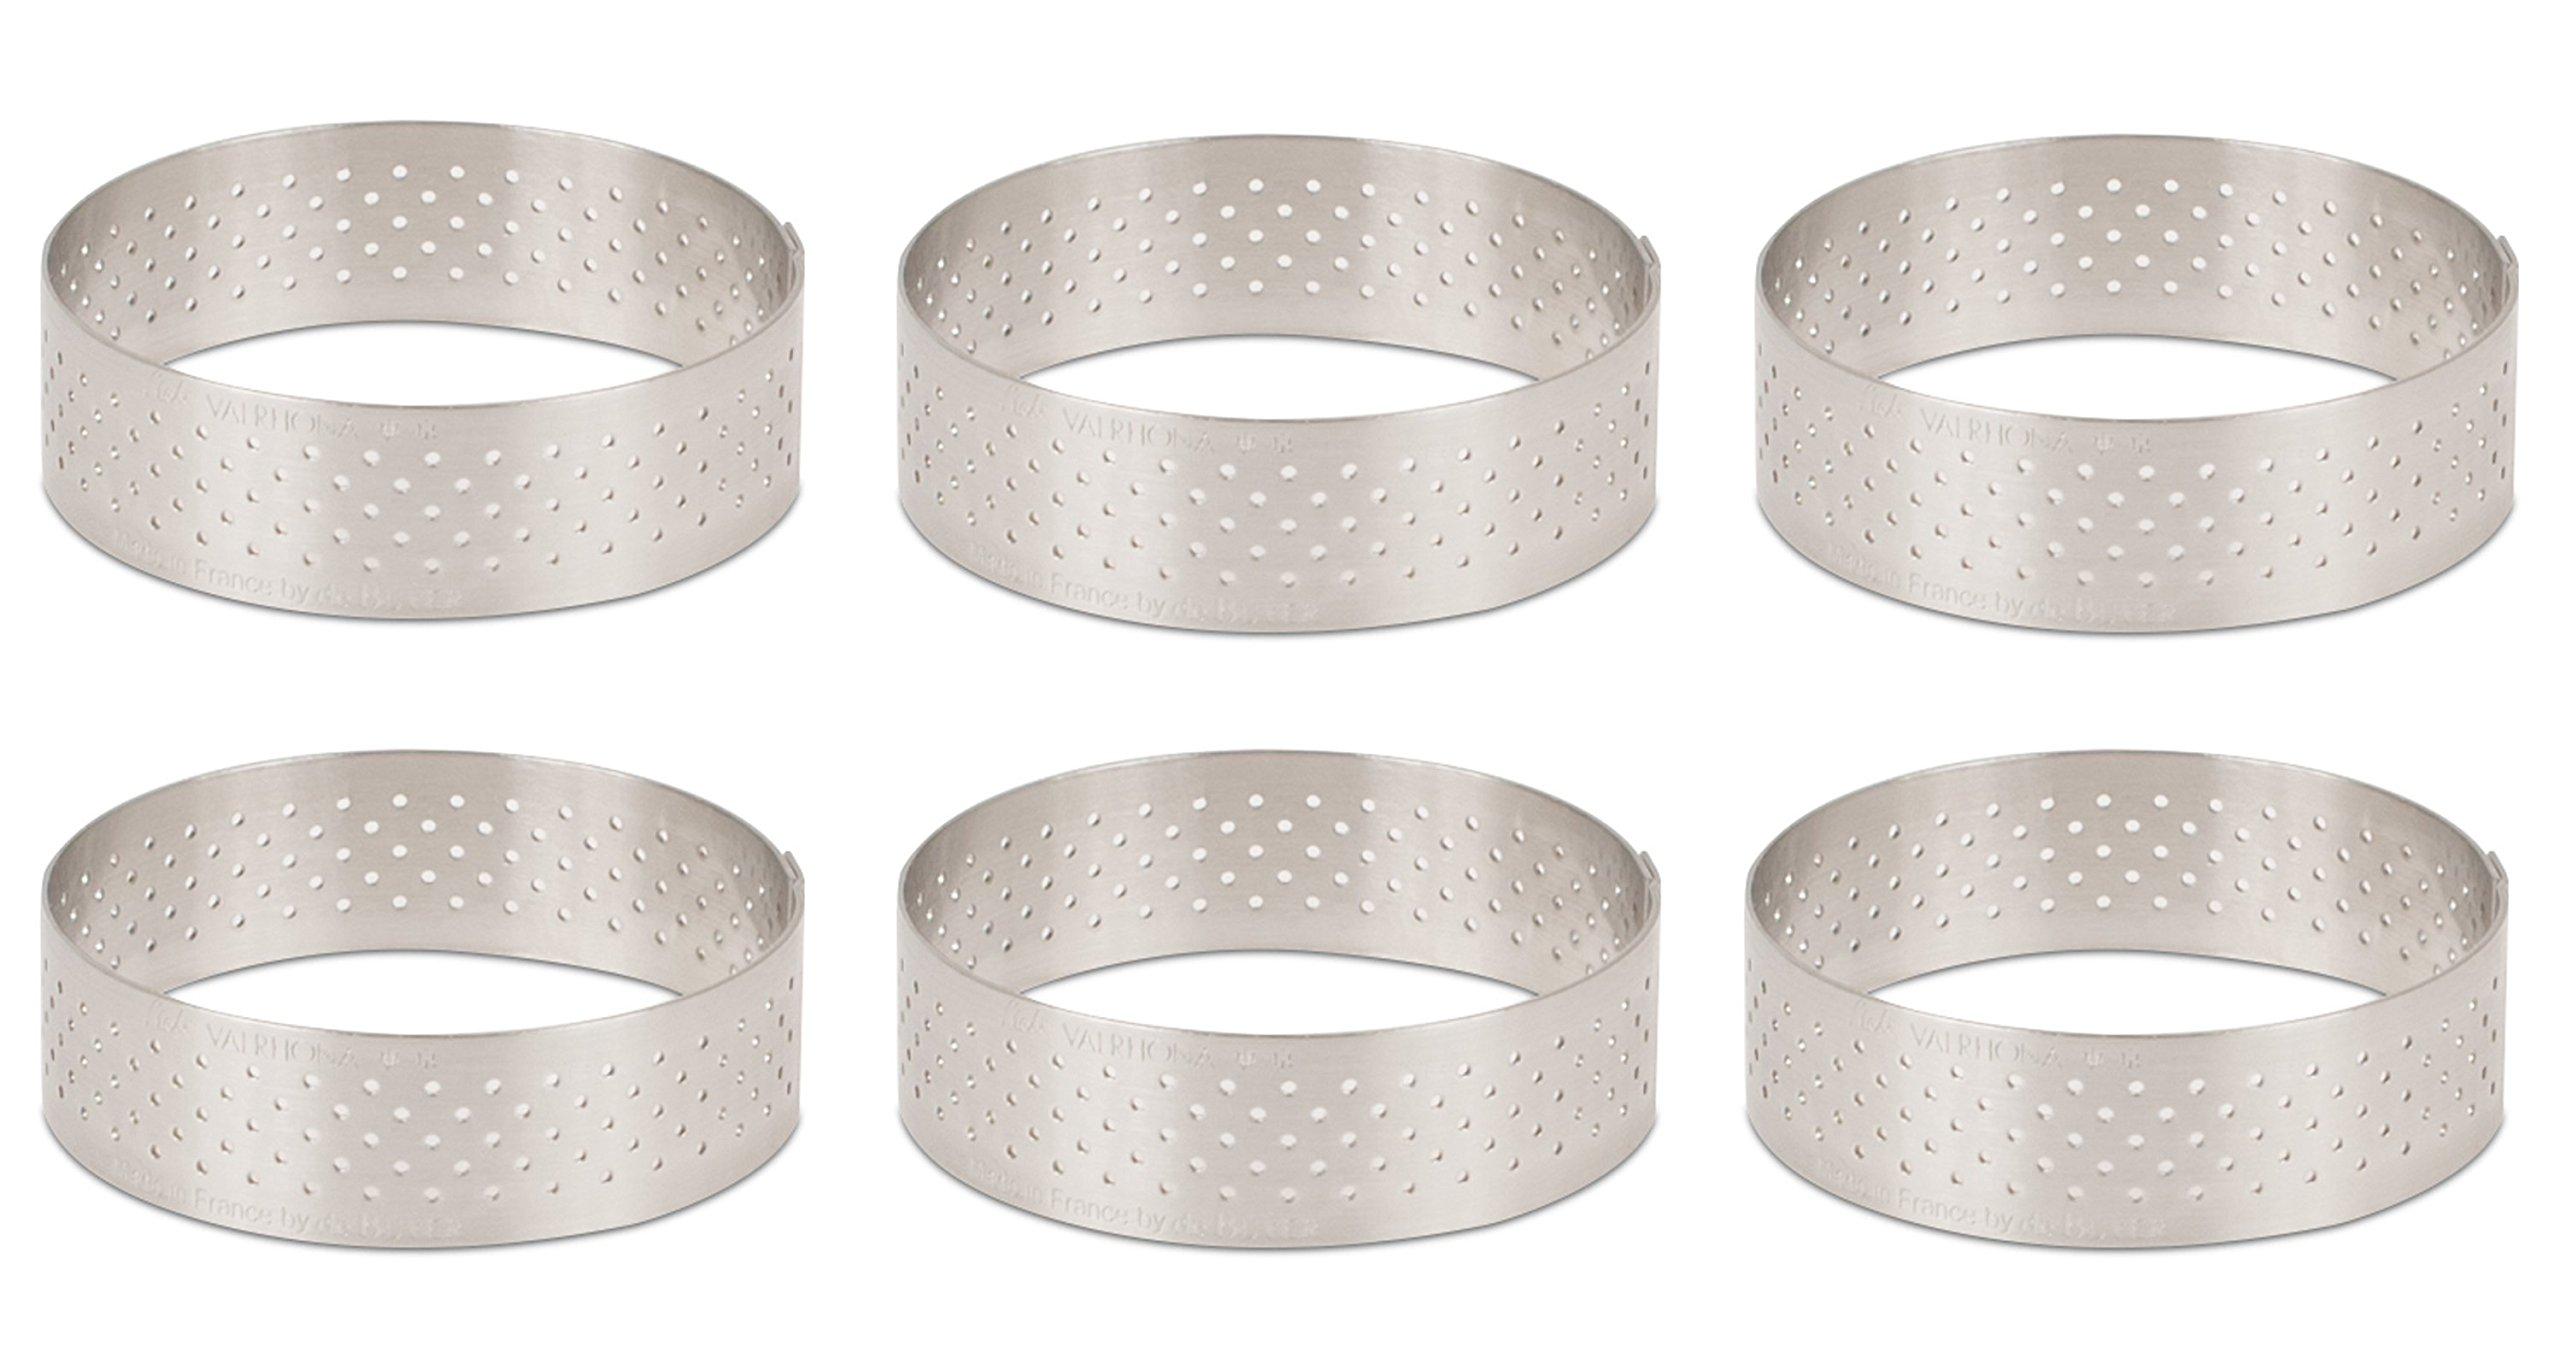 DeBuyer Valrhona Perforated Tart Ring - 2.25 inch Diameter, Set of 6 units